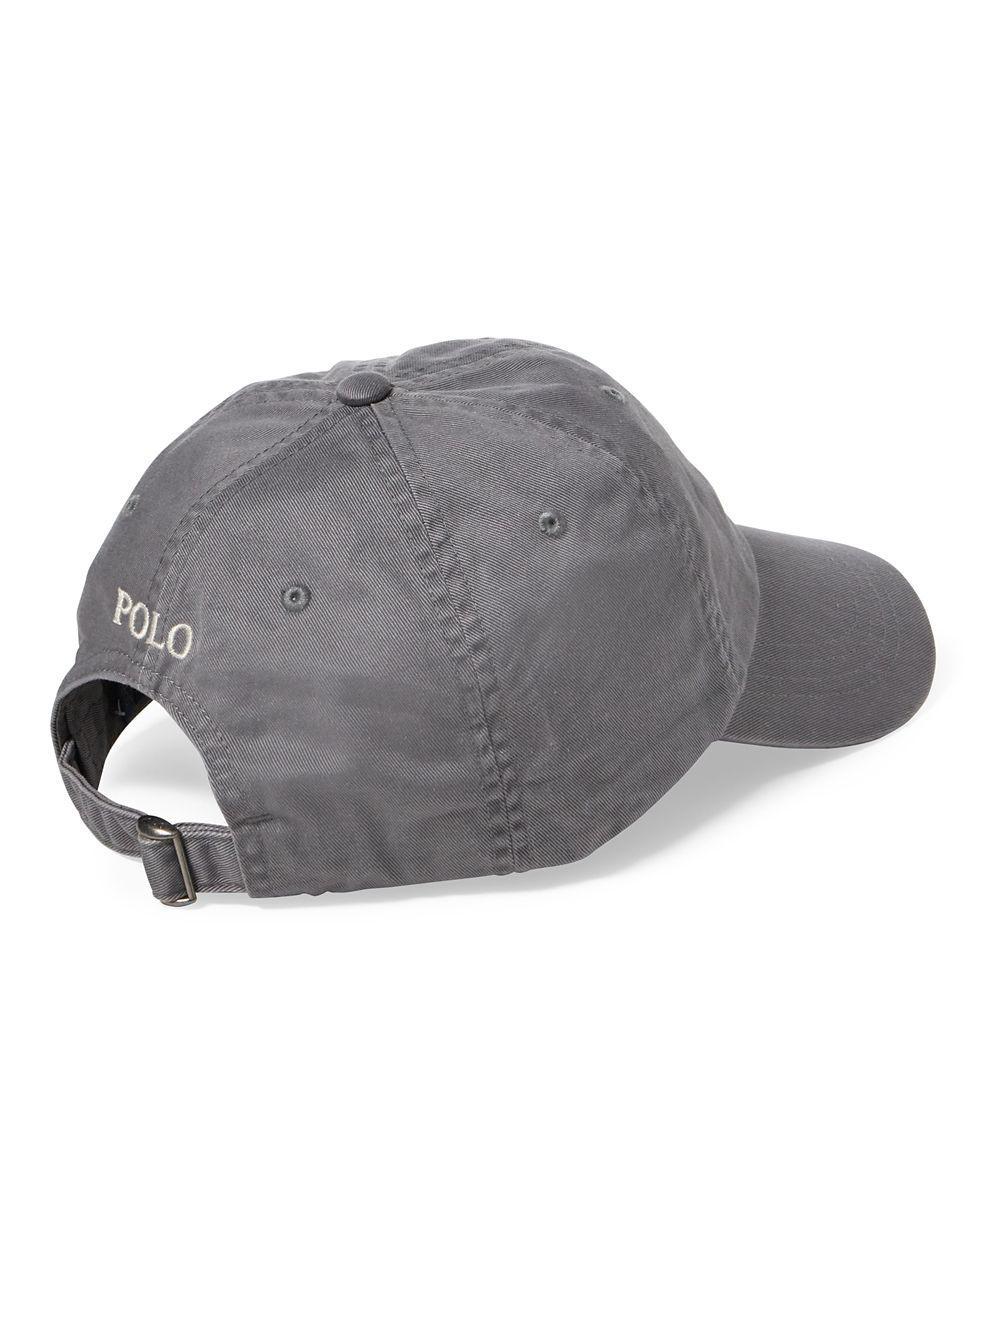 Polo Ralph Lauren - Gray Men s Chino Sports Cap for Men - Lyst. View  fullscreen f1472e8e9a5d